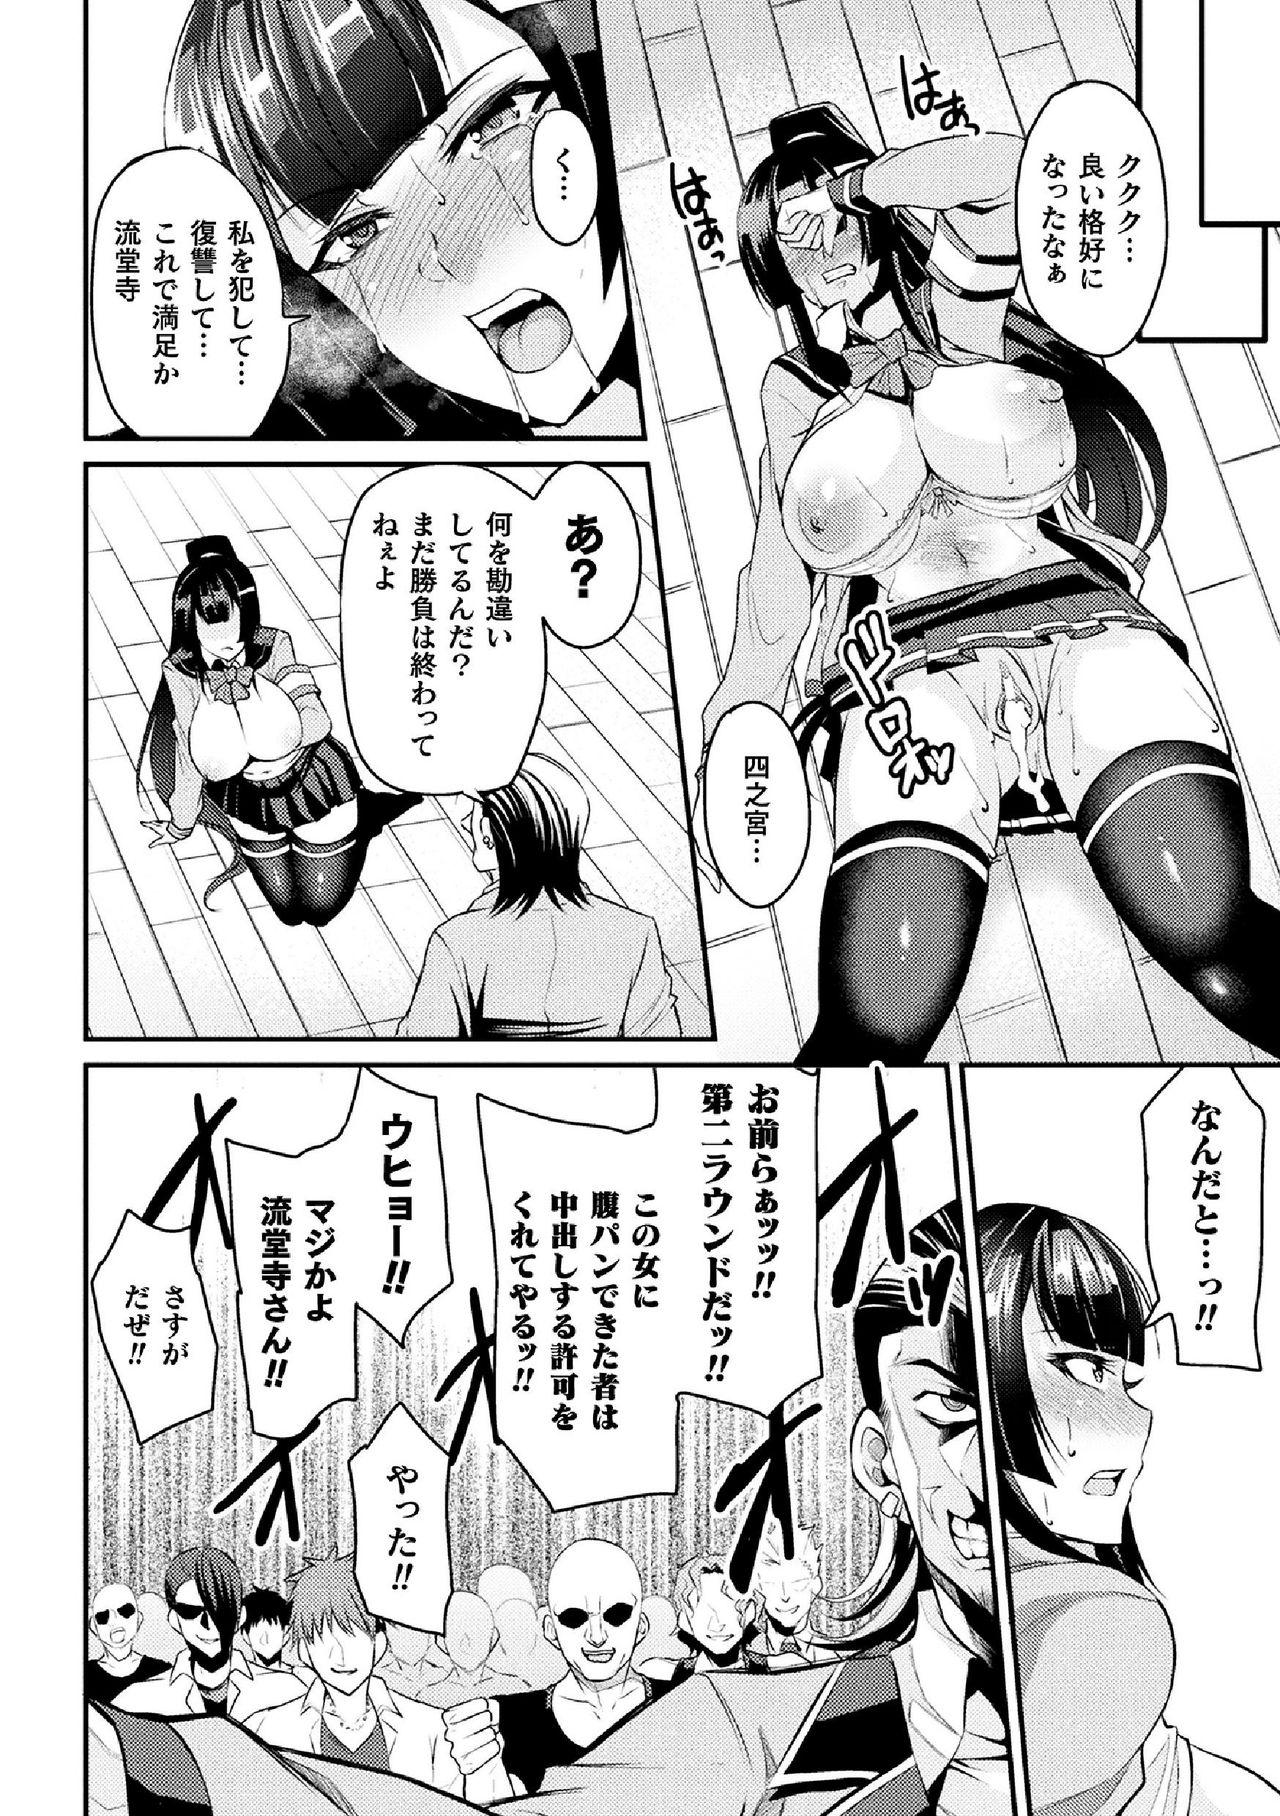 2D Comic Magazine Namaiki Onna ni HaraPun Seisai! Vol. 2 13